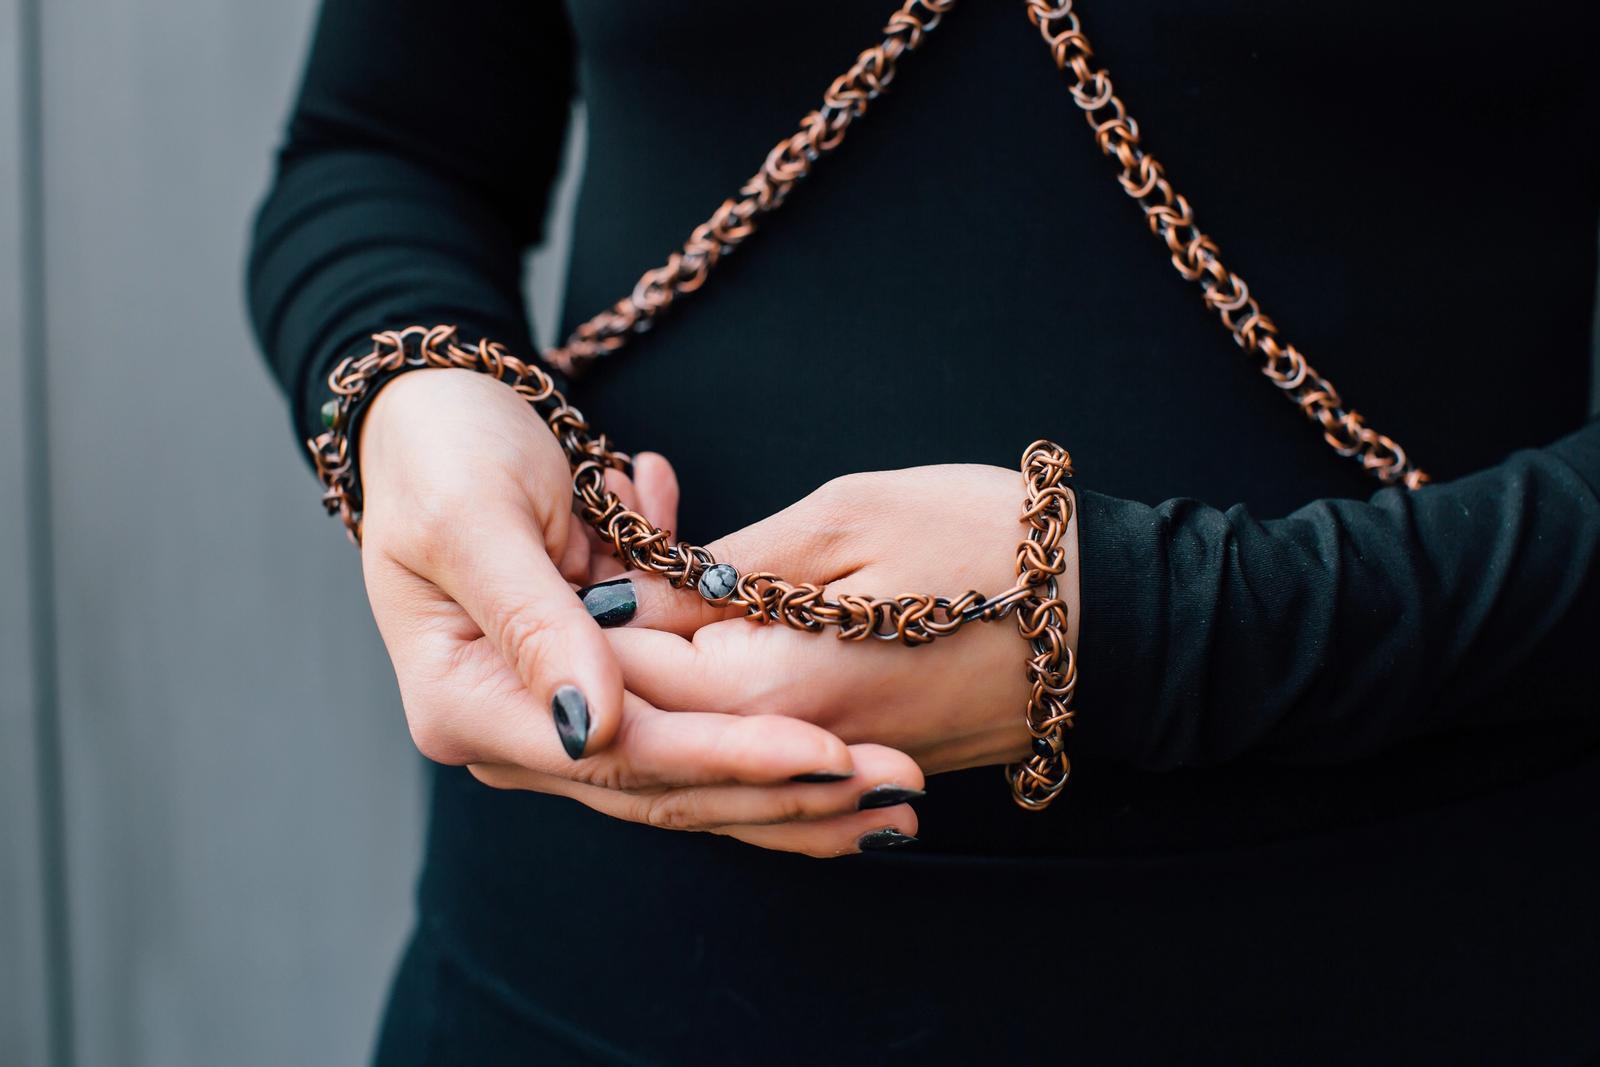 Convertible handcuff link